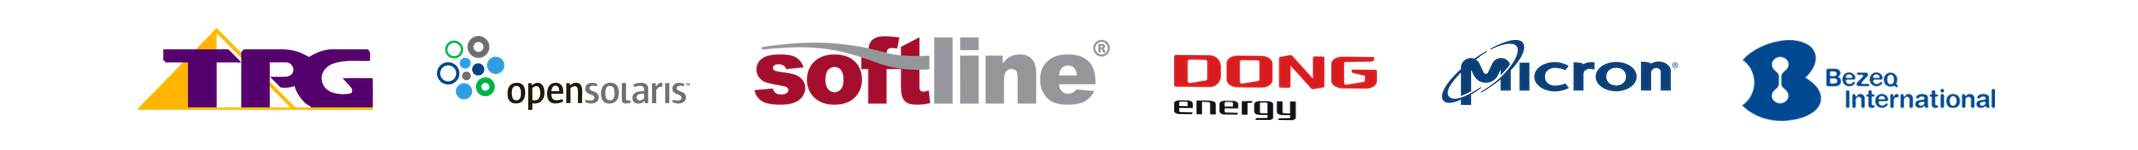 customer-brand-logos-6